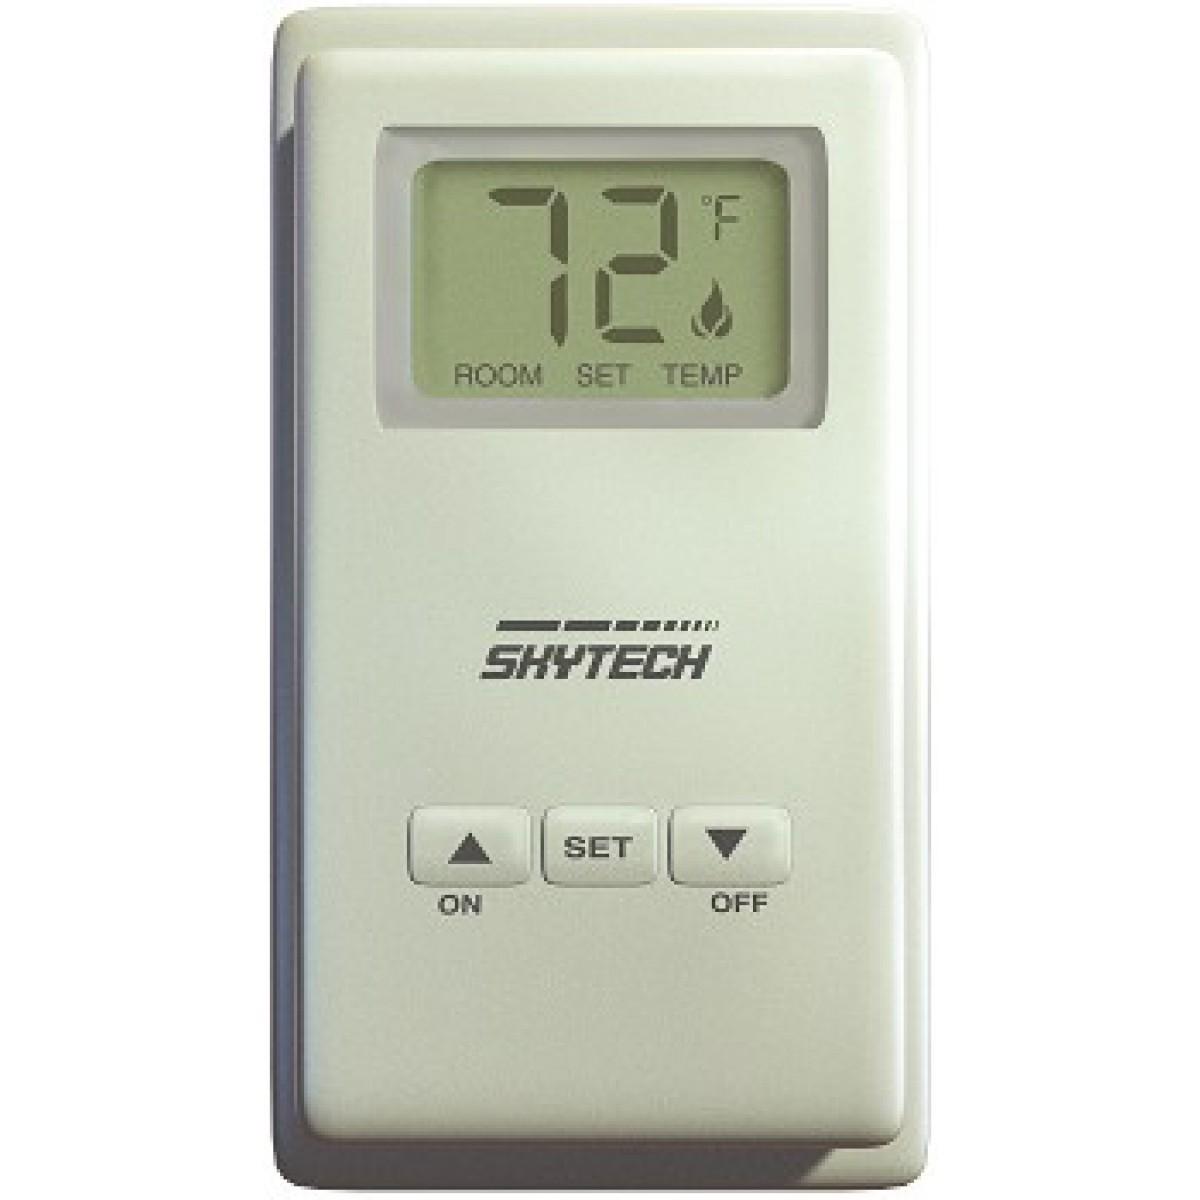 Skytech Sky Ts R 2 Wireless Wall Fireplace Remote Control